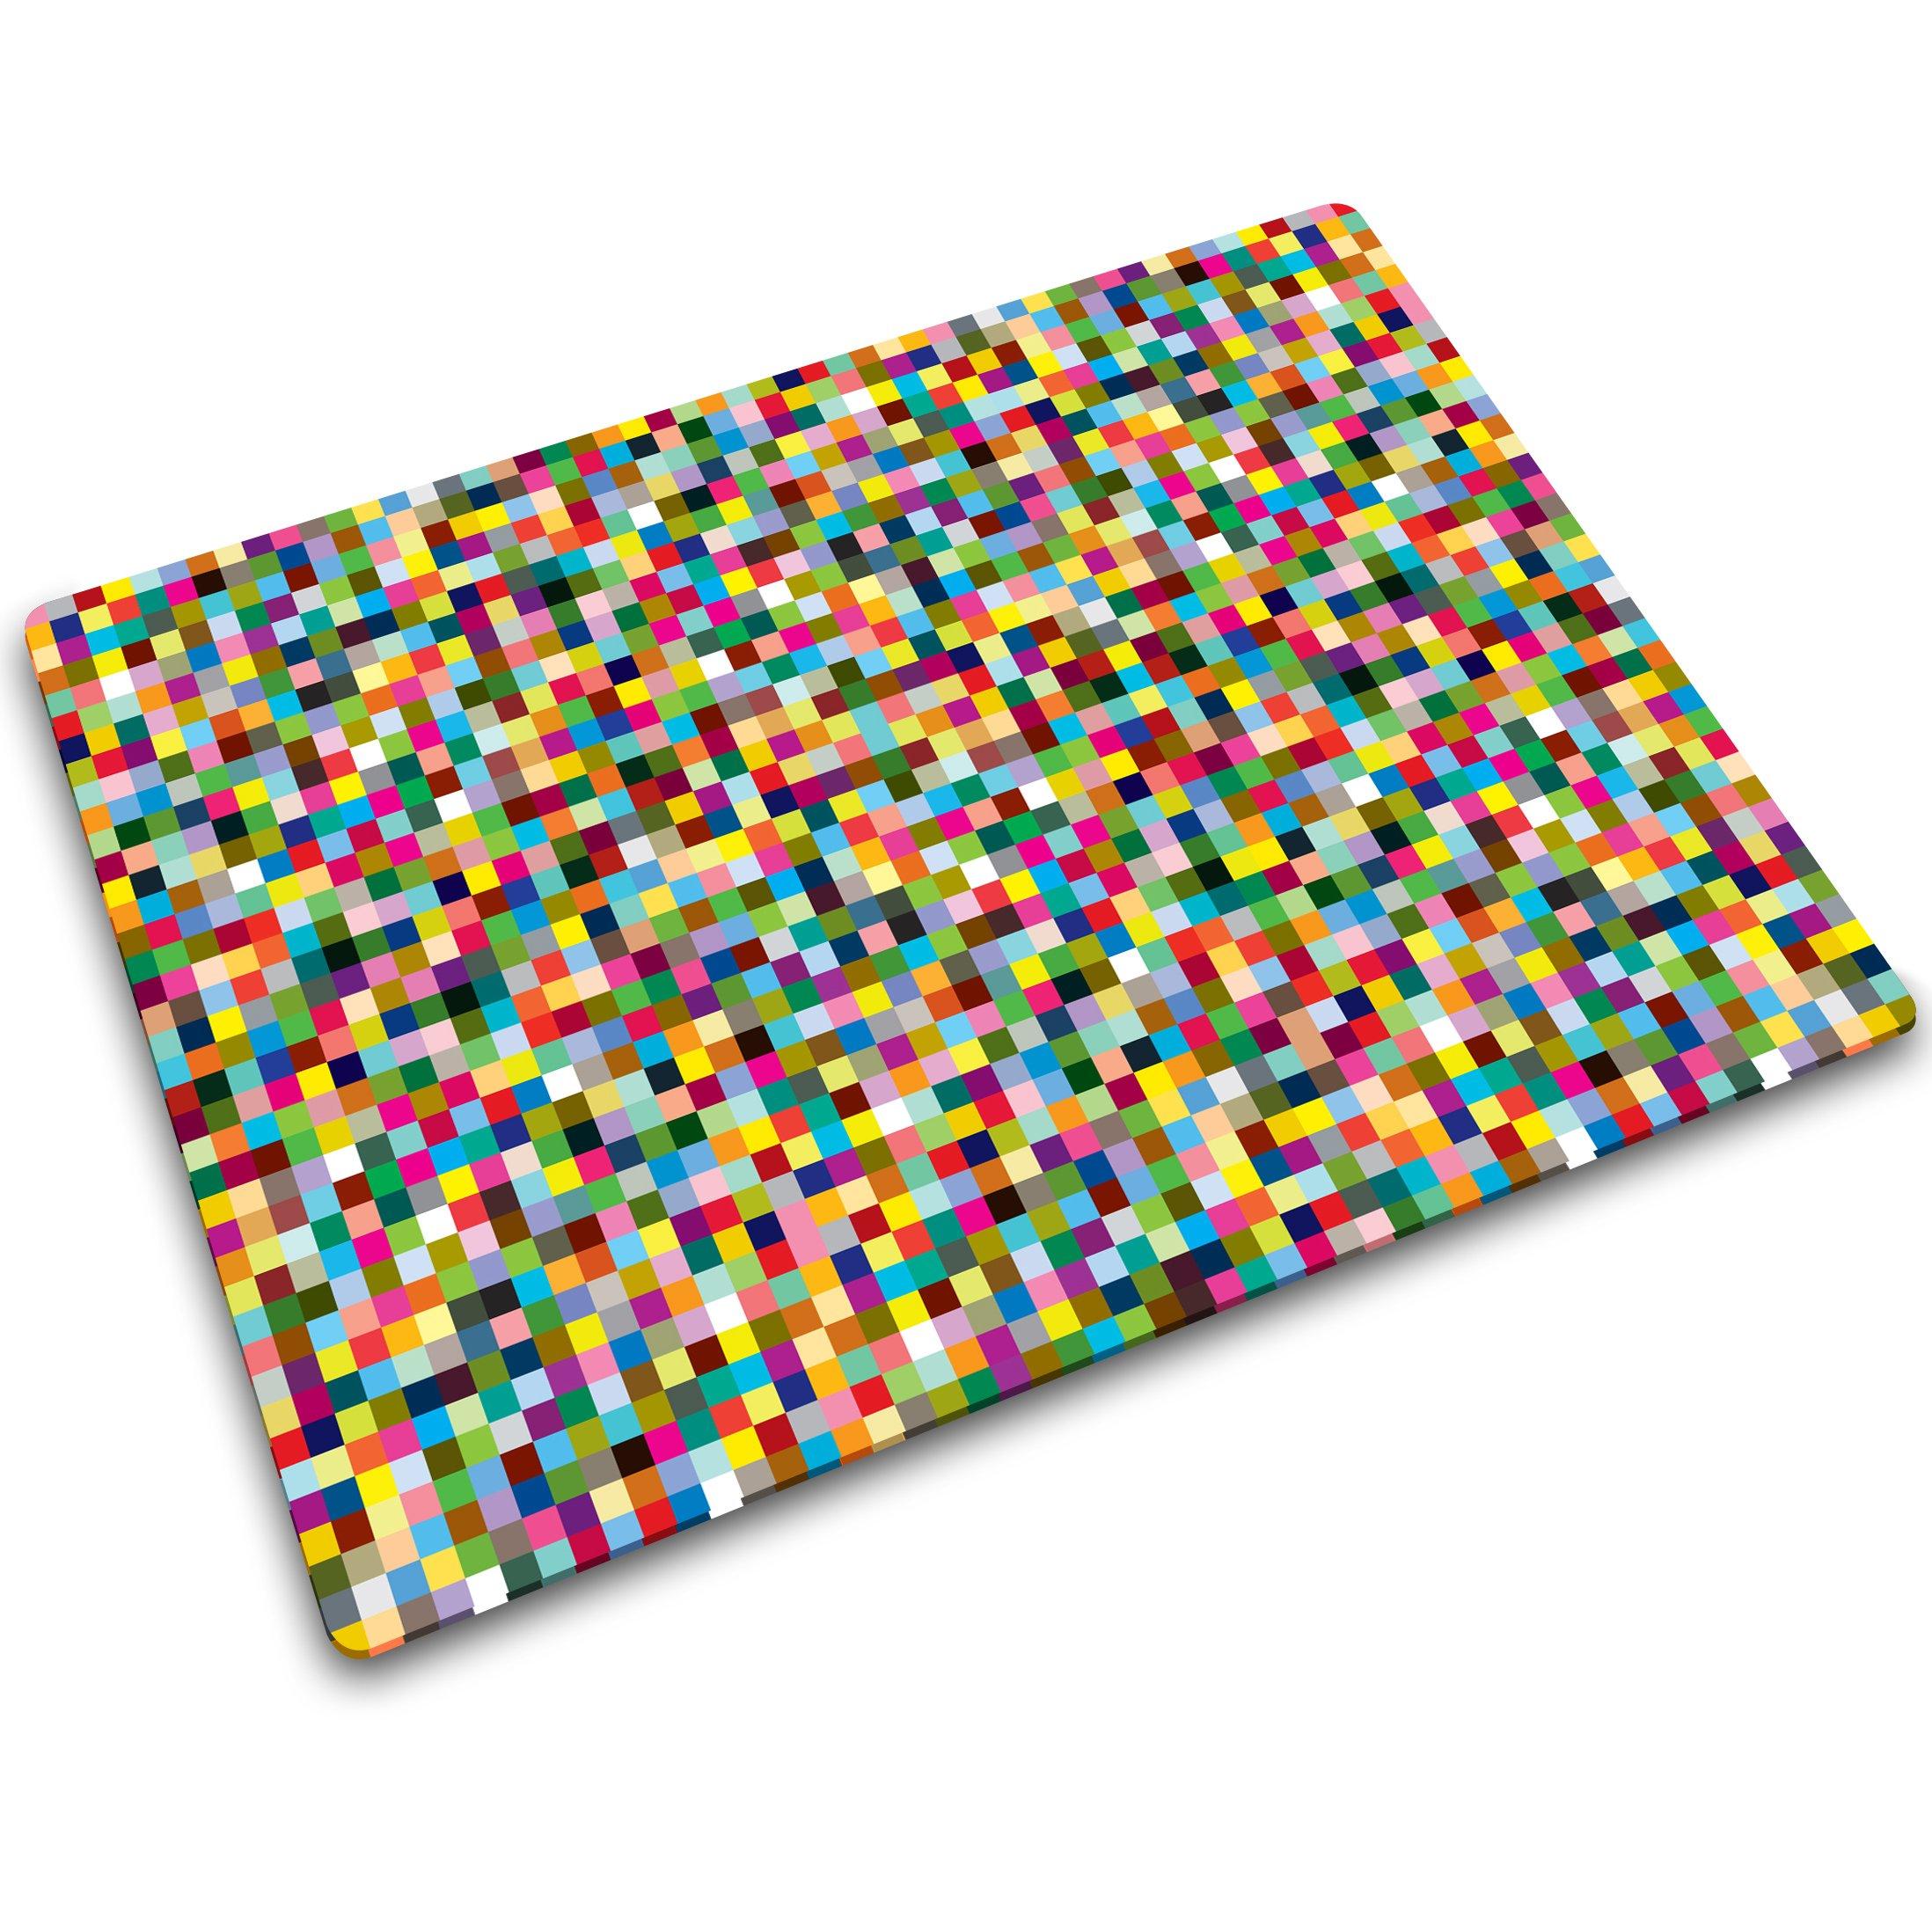 Joseph Joseph MIMO012AS Mini Mosaic Worktop Saver, 12 x 16 inches